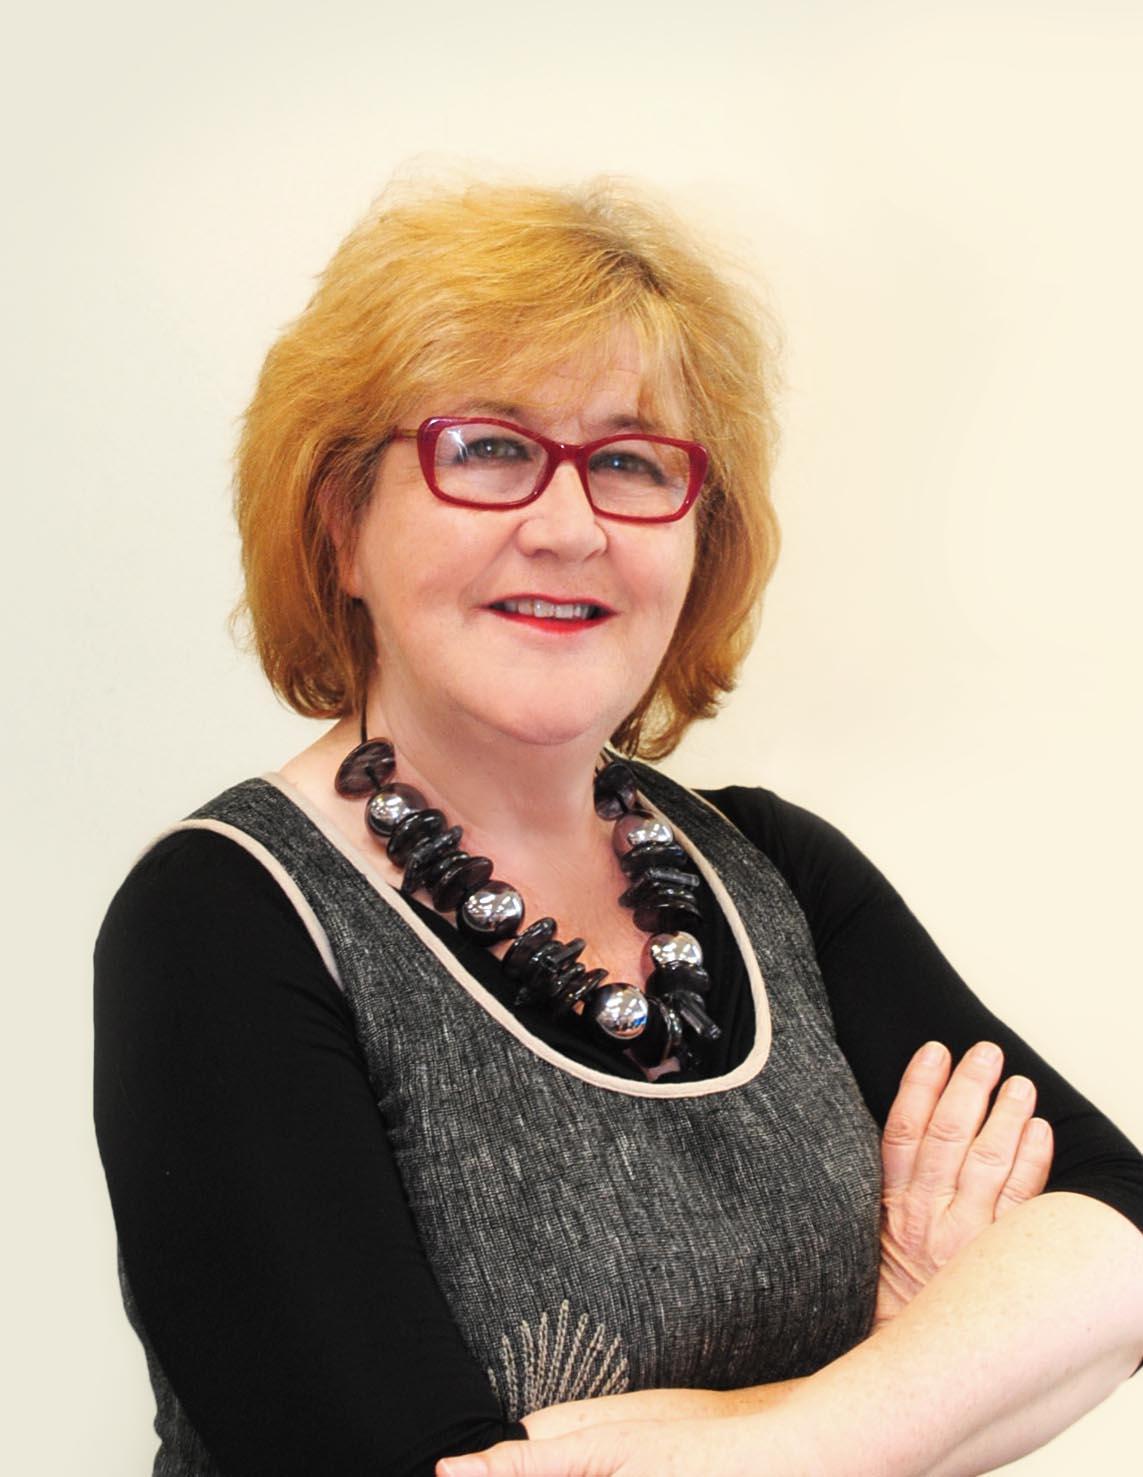 Irish Storyteller Liz Weir at Rocky Mountain Storytelling Conference April 12-14 in Golden CO